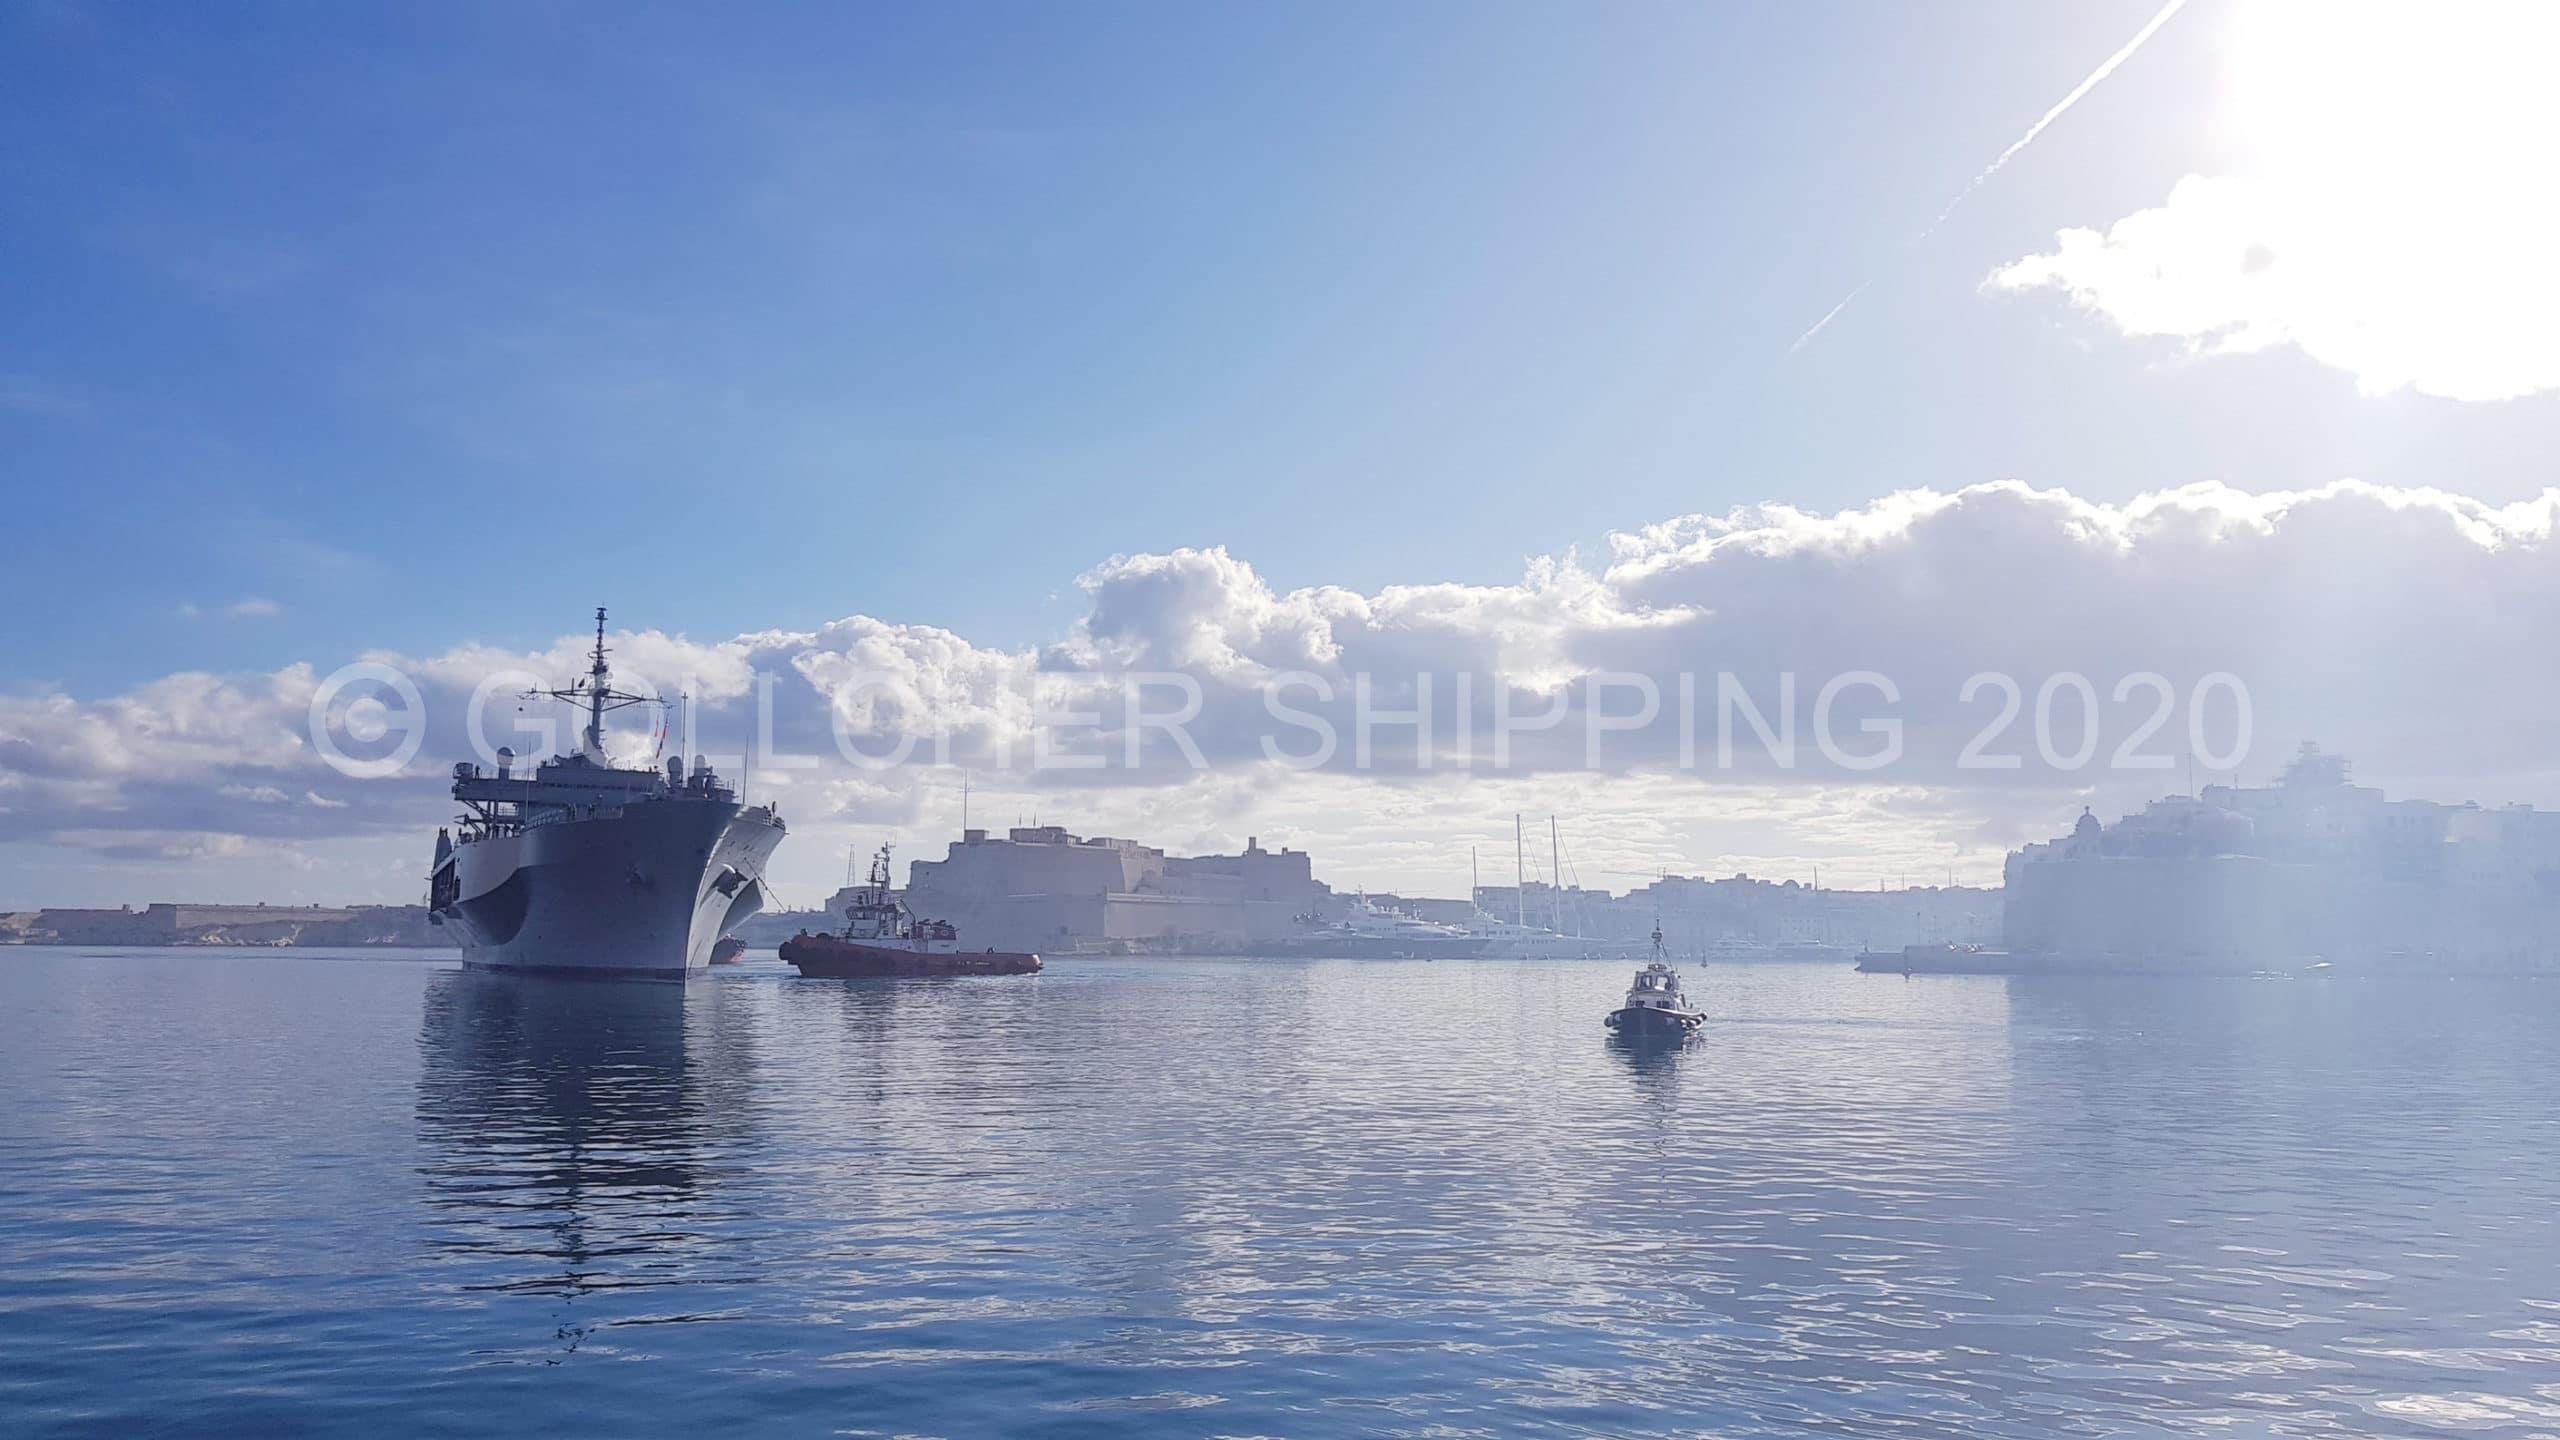 Shipping Agent Award For USS Mt. Whitney Port Visit In Malta